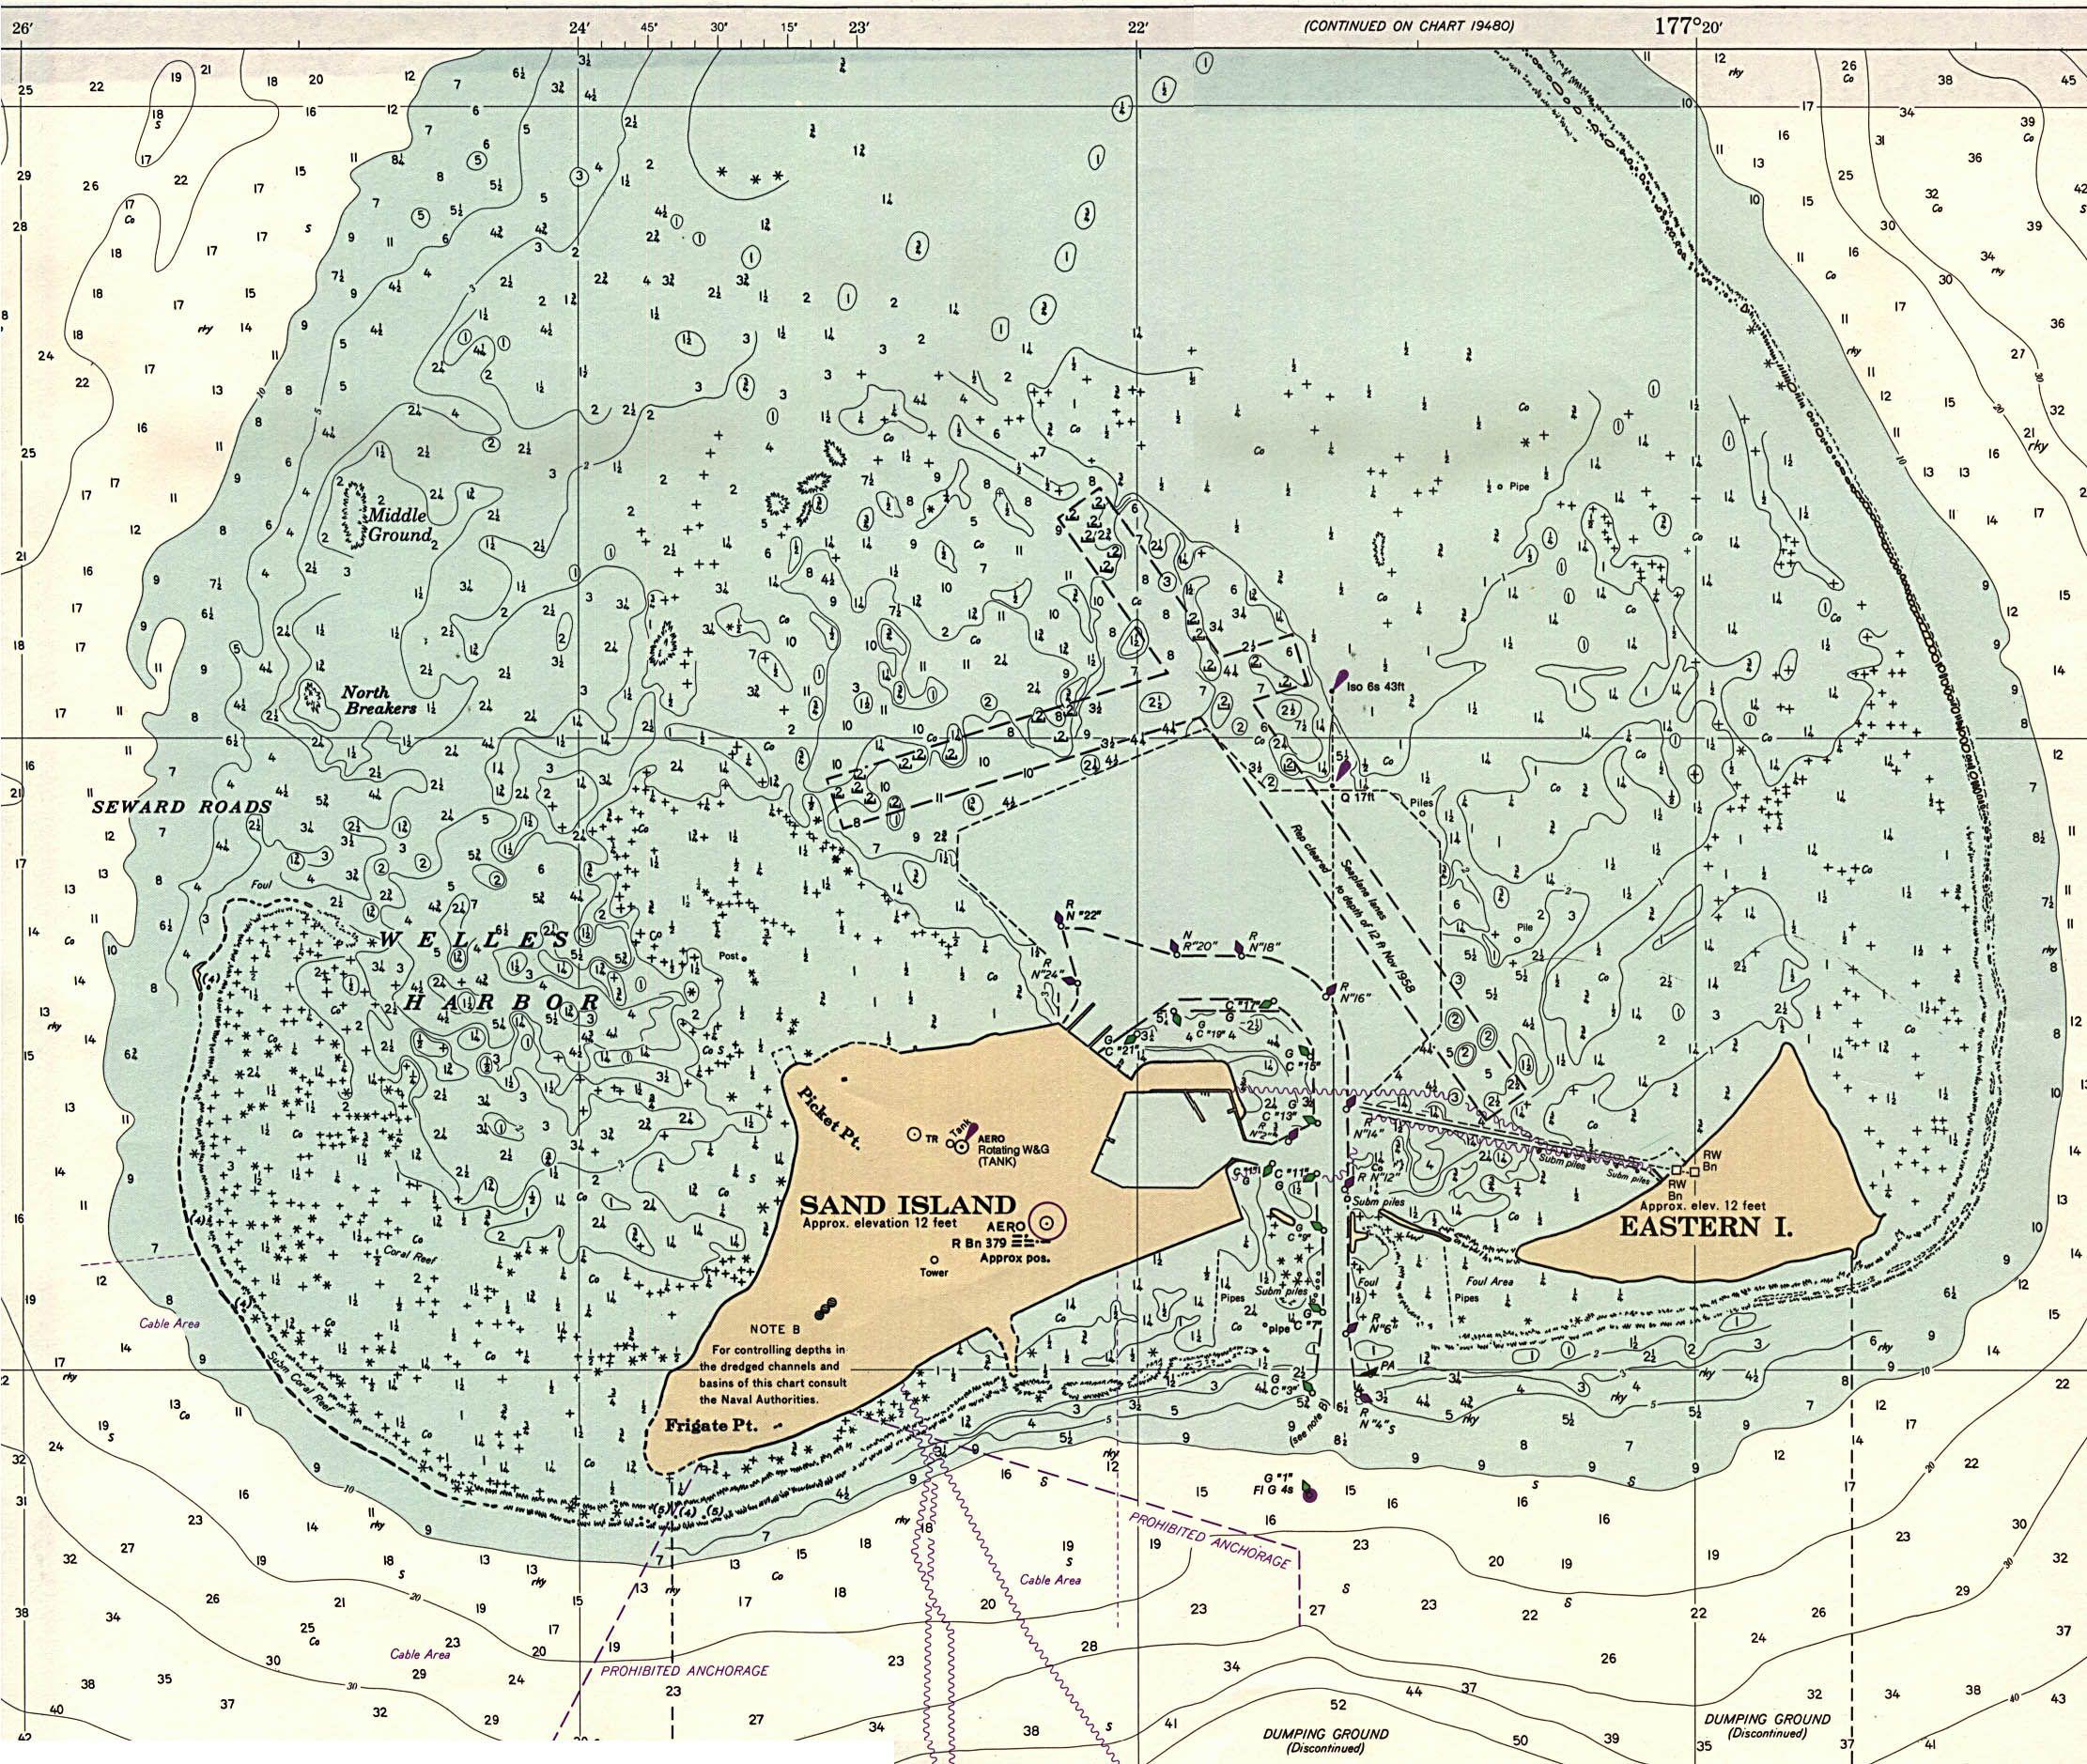 Nautical chart symbols google search low tide brewing nautical chart symbols google search nvjuhfo Choice Image